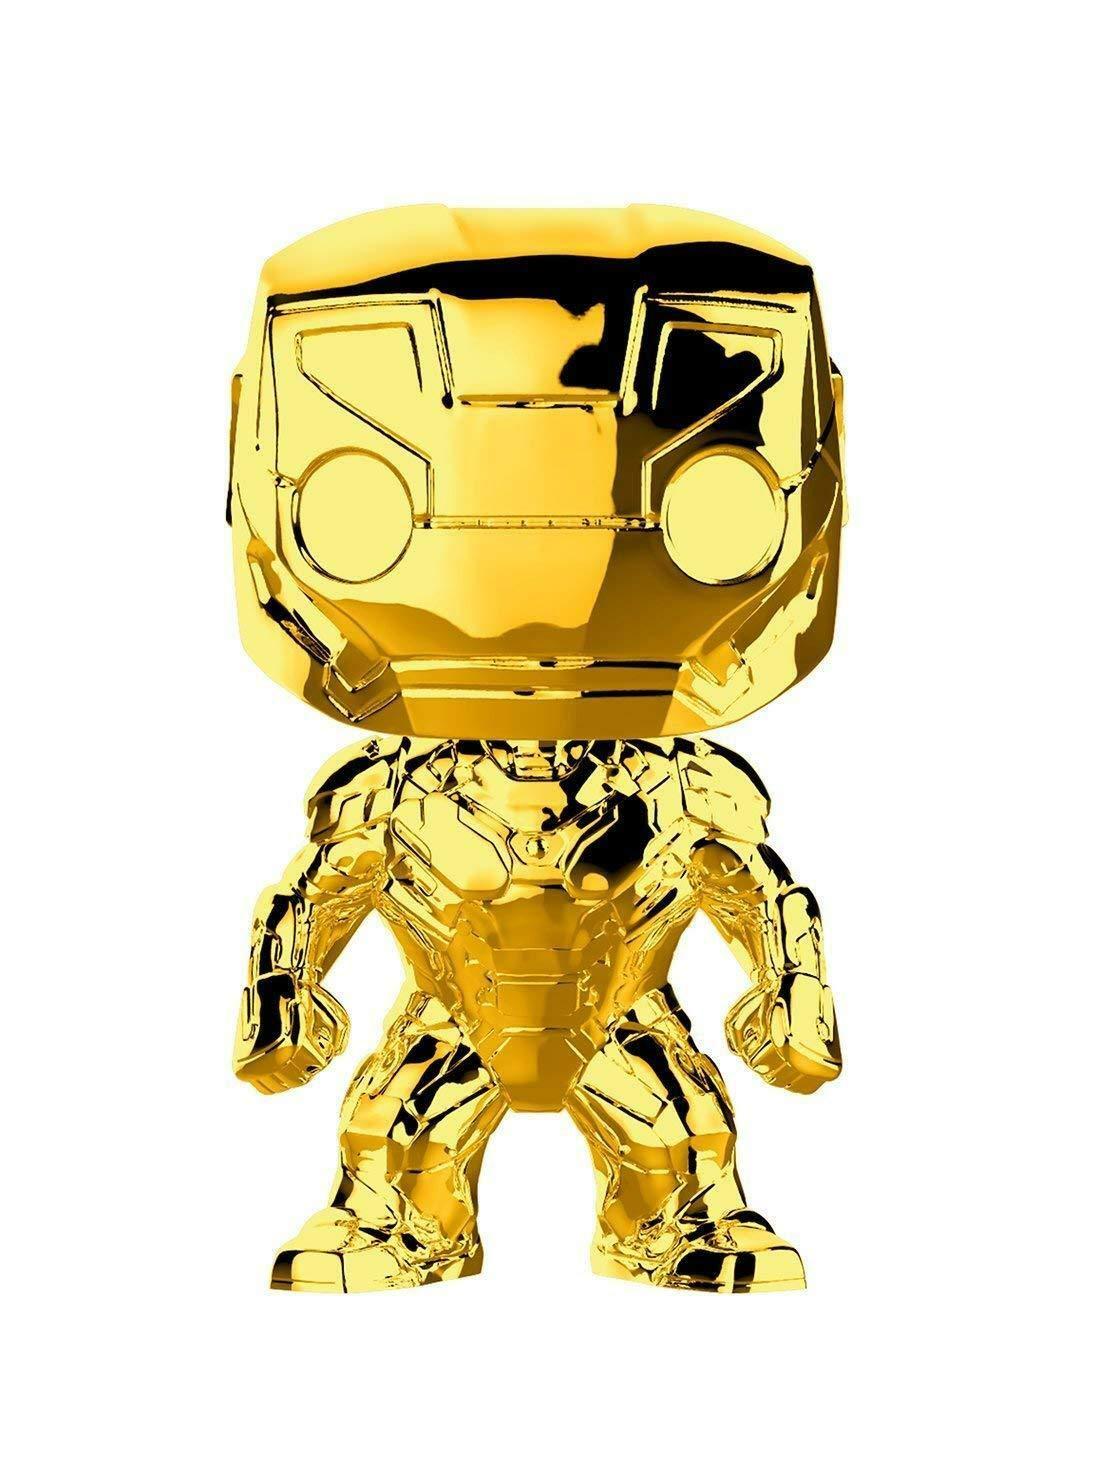 Multicolor 33434 Iron Man Collectible Figure Gold Chrome Funko Pop Marvel: Marvel Studios 10